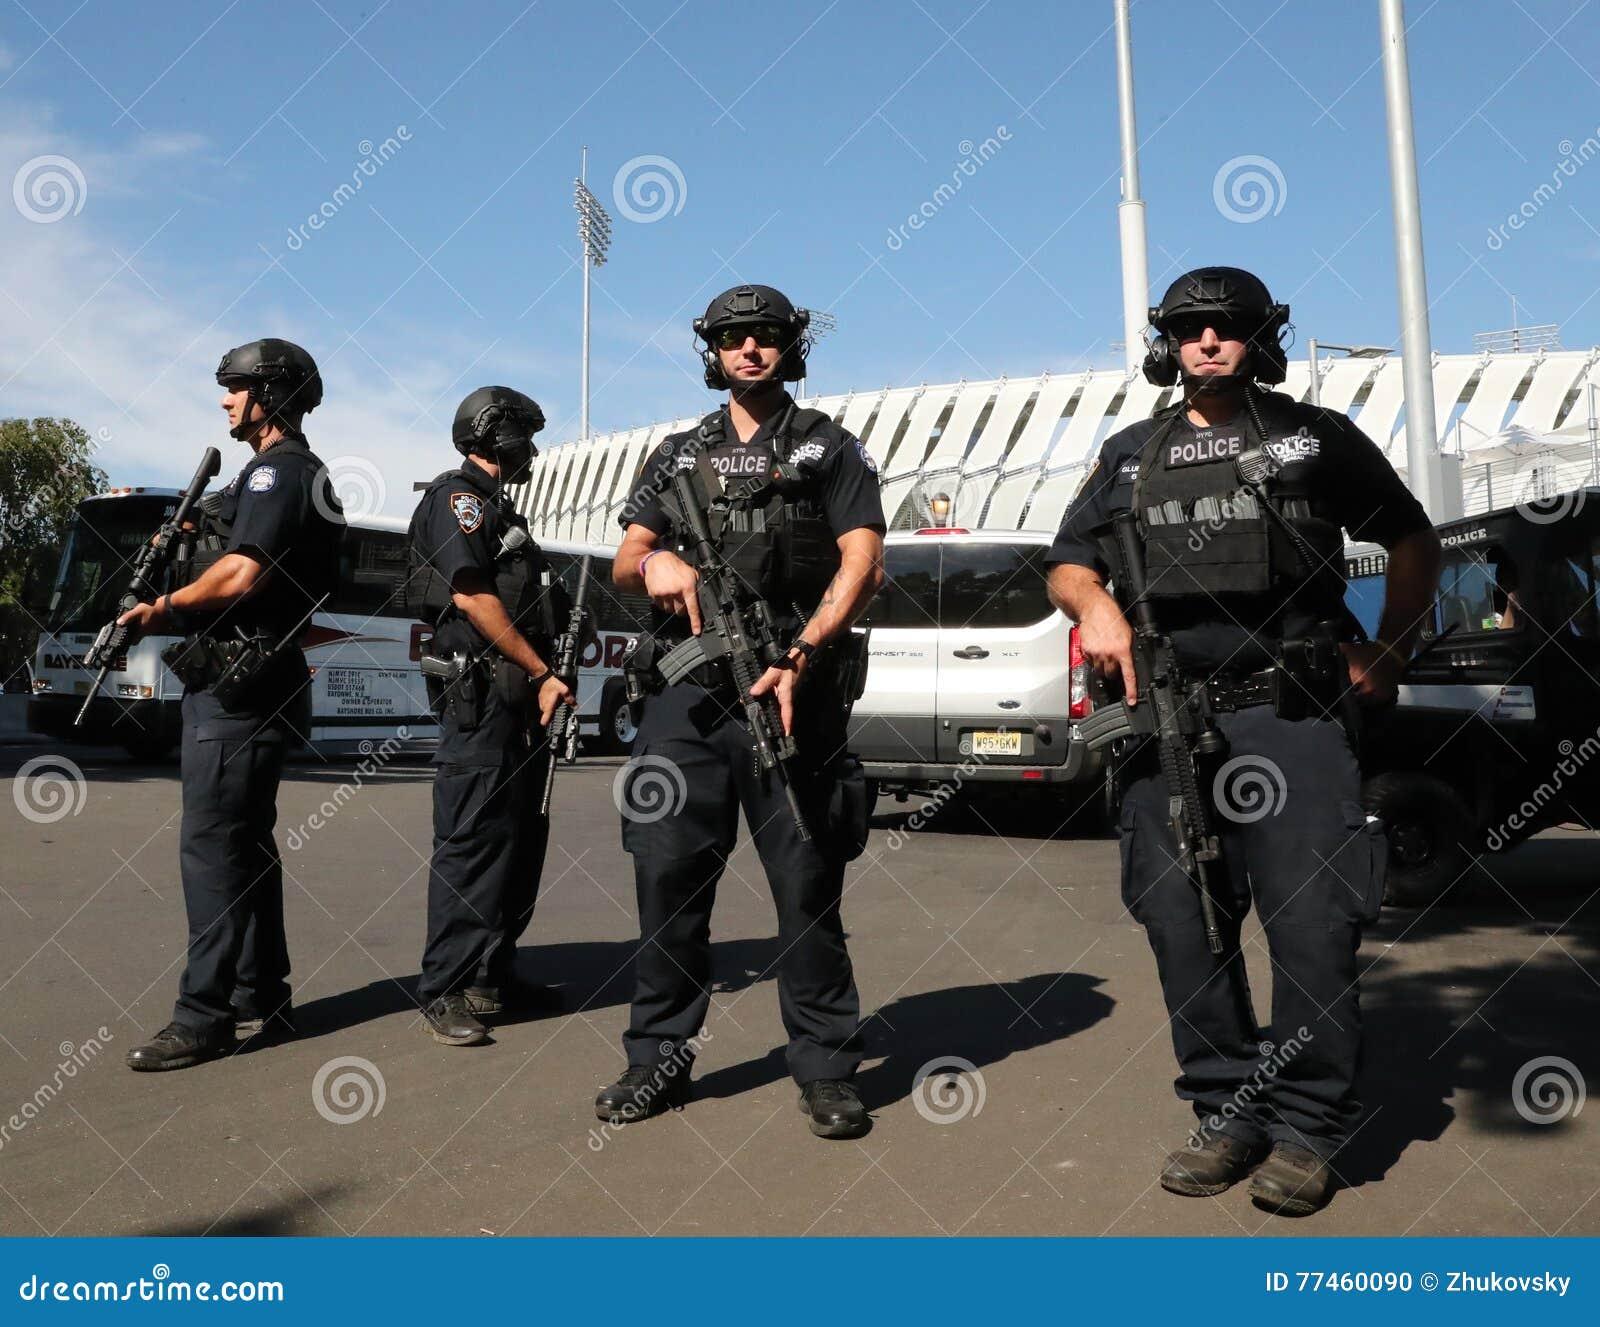 essay on national counter terrorism center